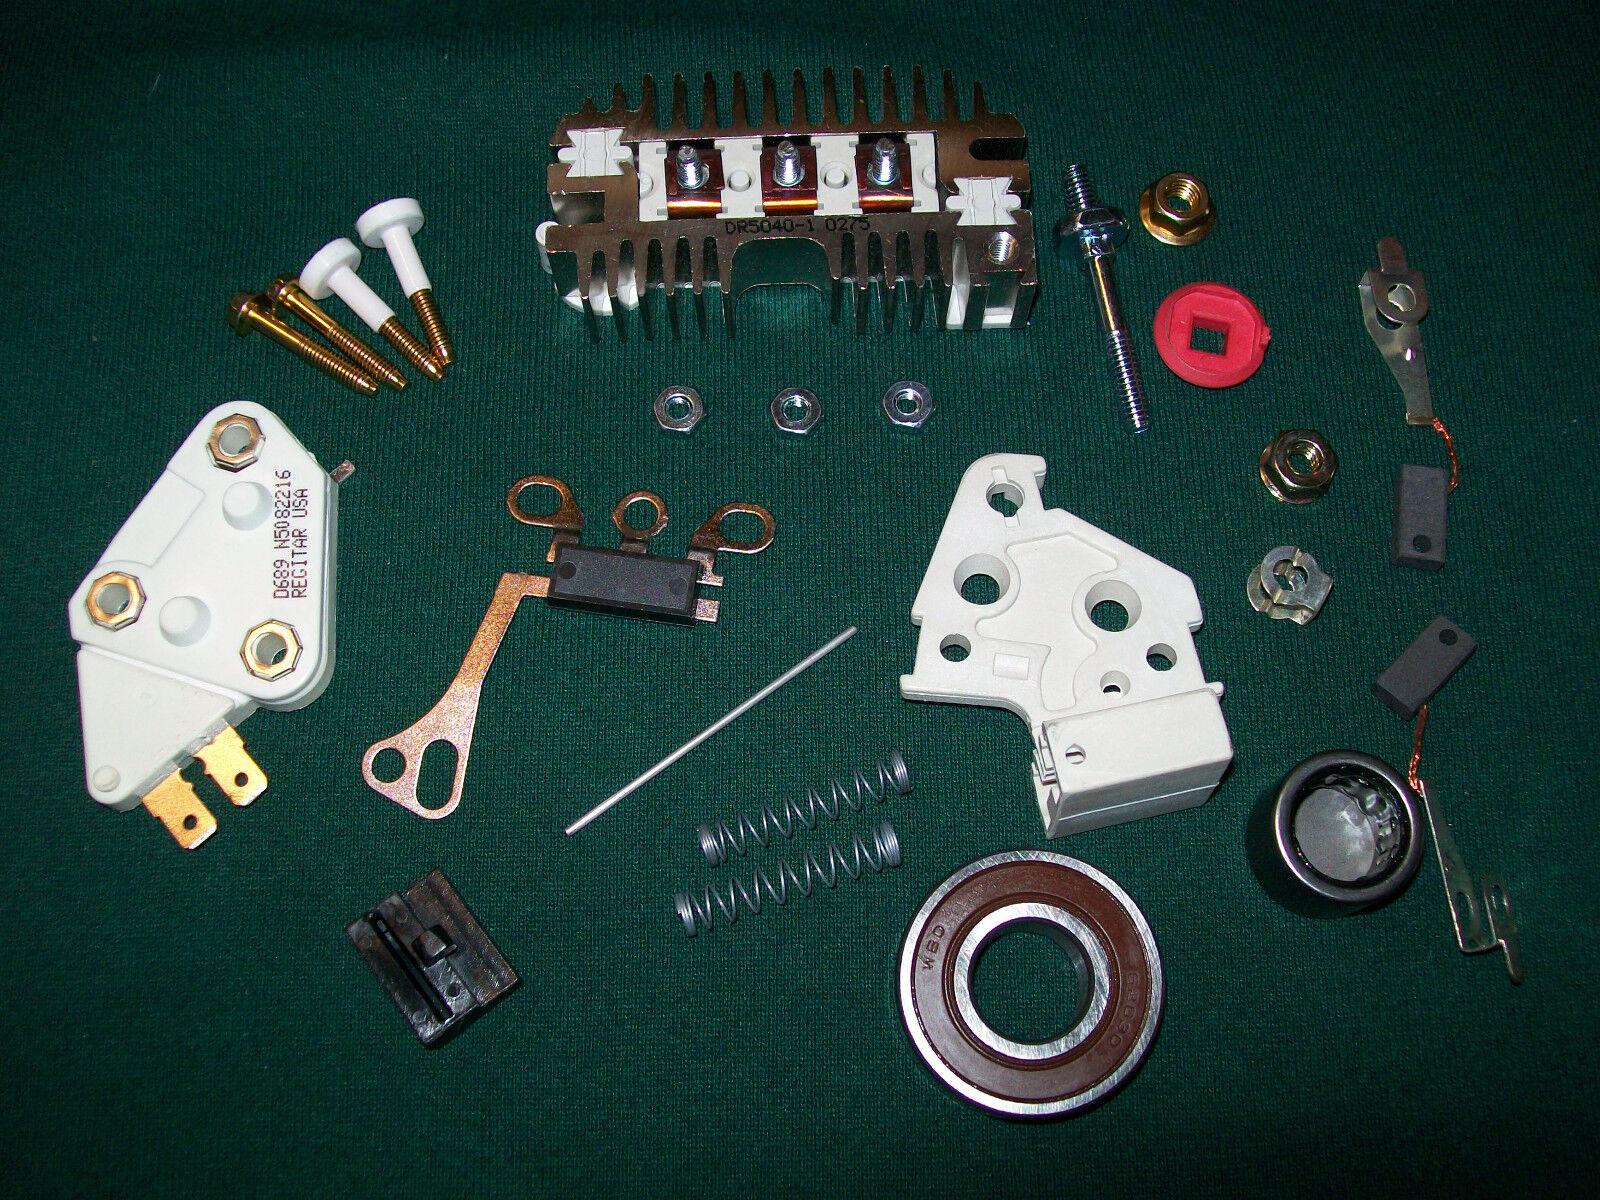 Gm Alternator Conversion Kits : Si delco alternator wire self excited regulator